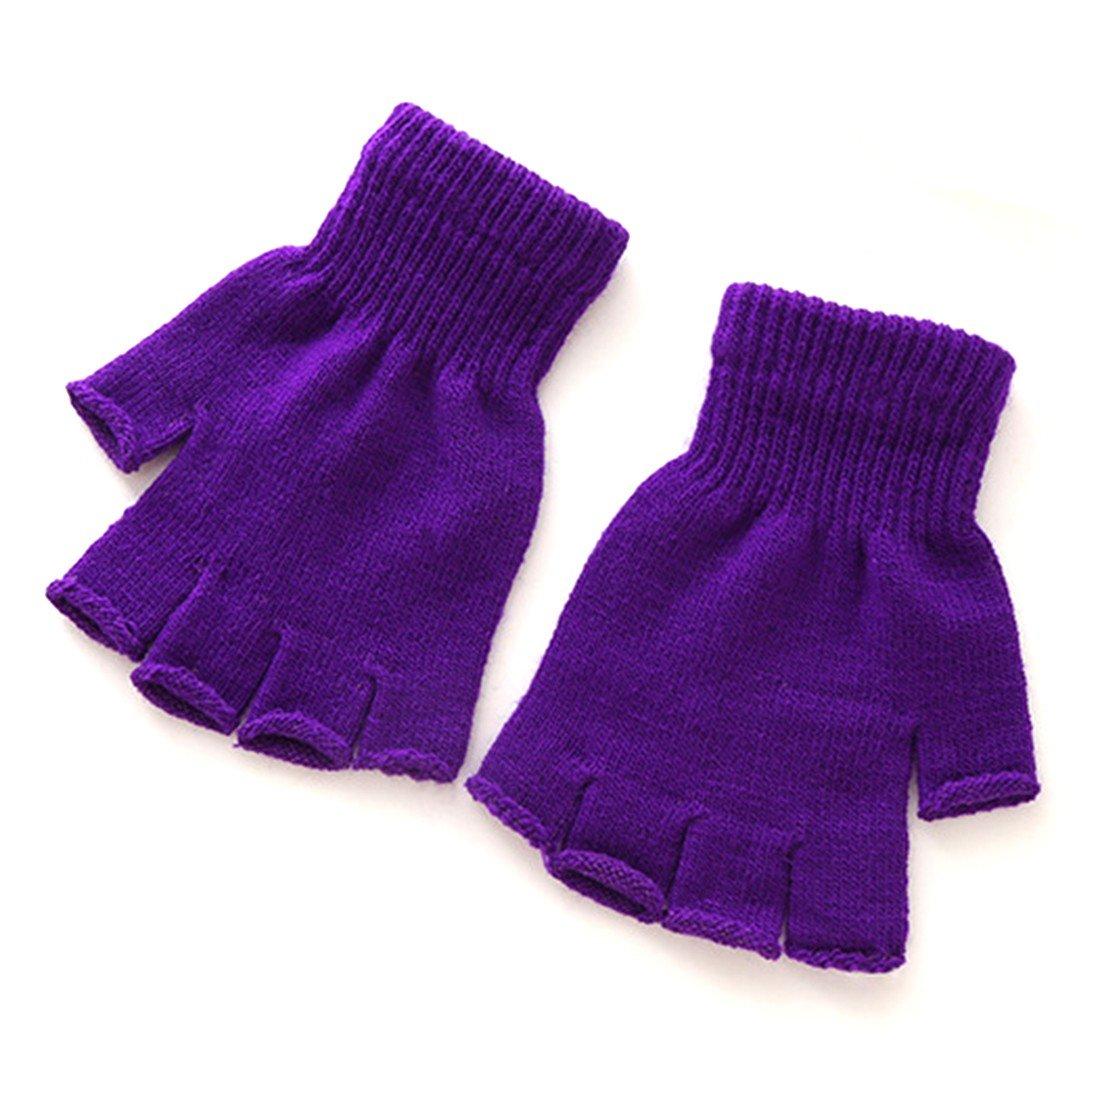 1 Pair Winter Soft Warm Elastic Knitted Stretch Half Finger Gloves Purple